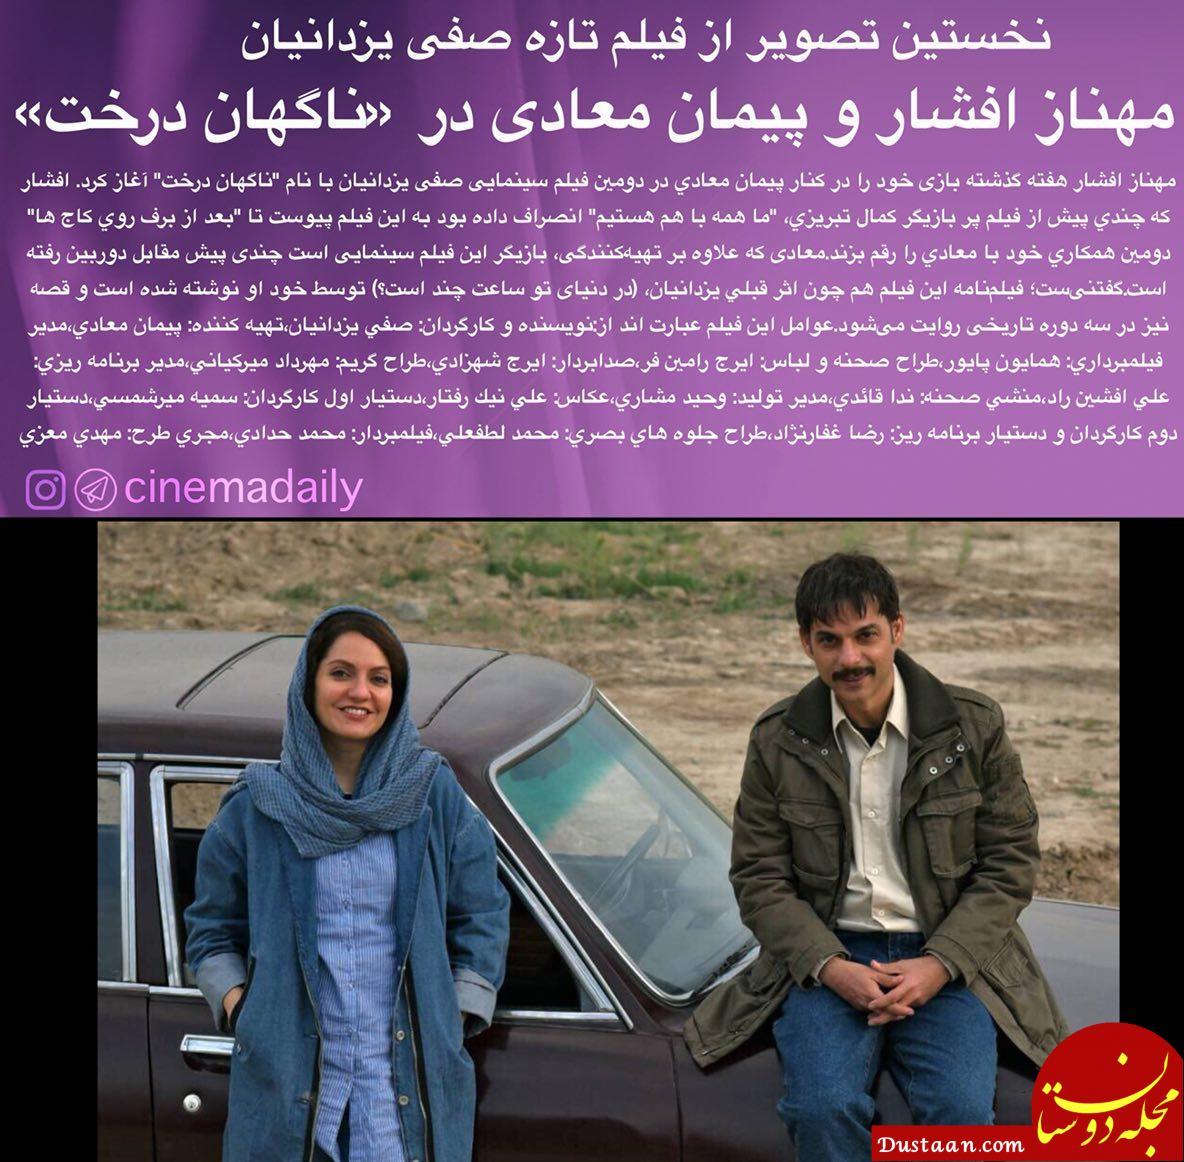 www.dustaan.com نخستین تصویر از مهناز افشار و پیمان معادی در «ناگهان درخت»